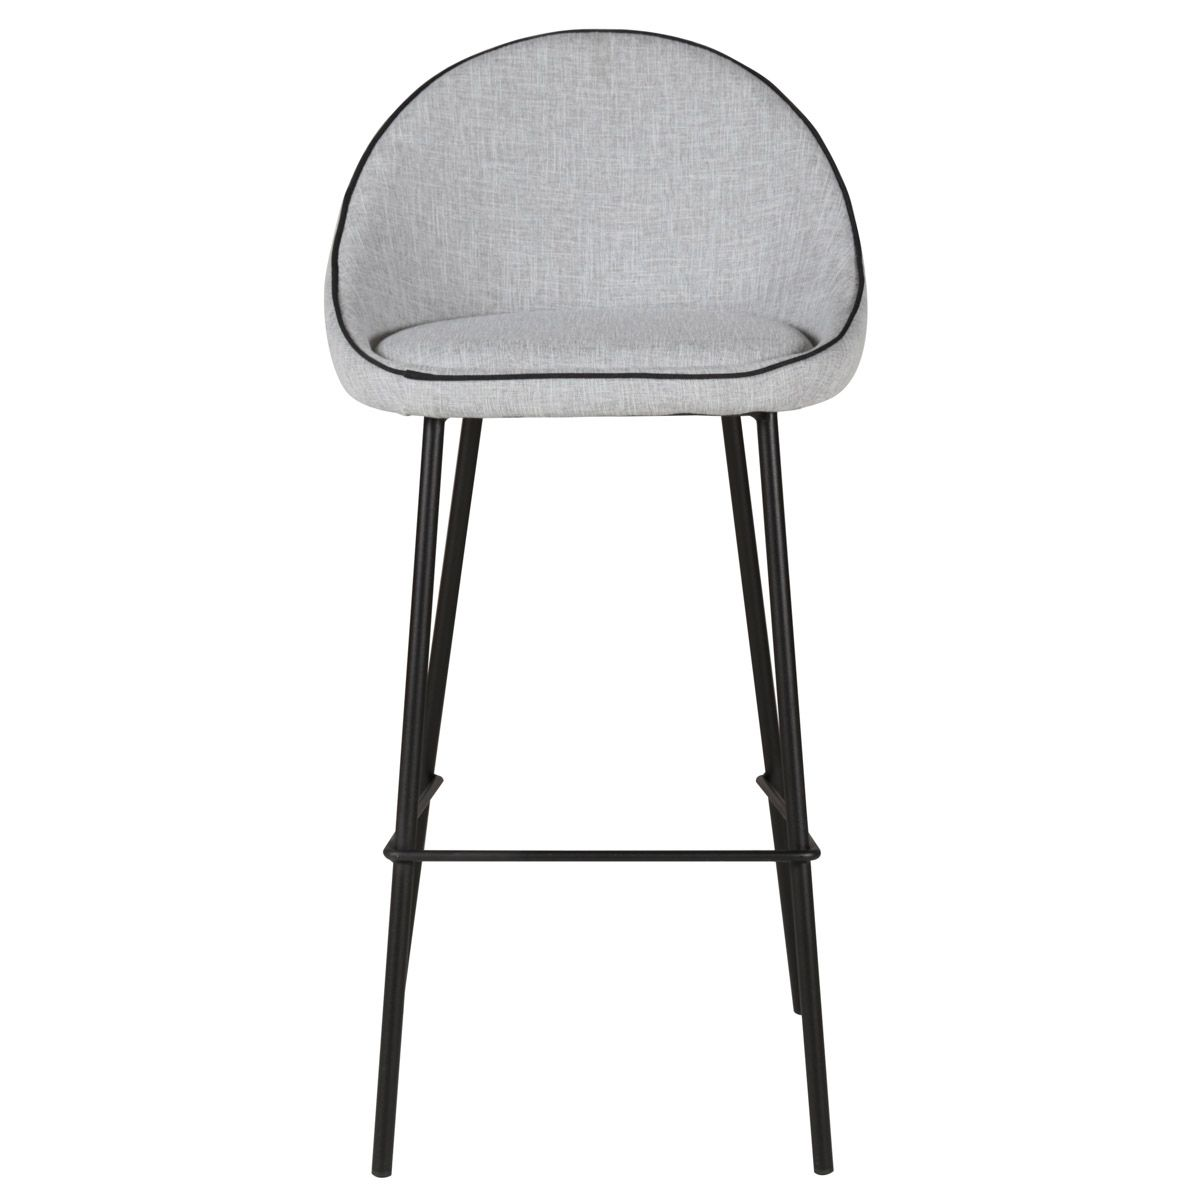 Chaise de bar design en tissu  gris clair